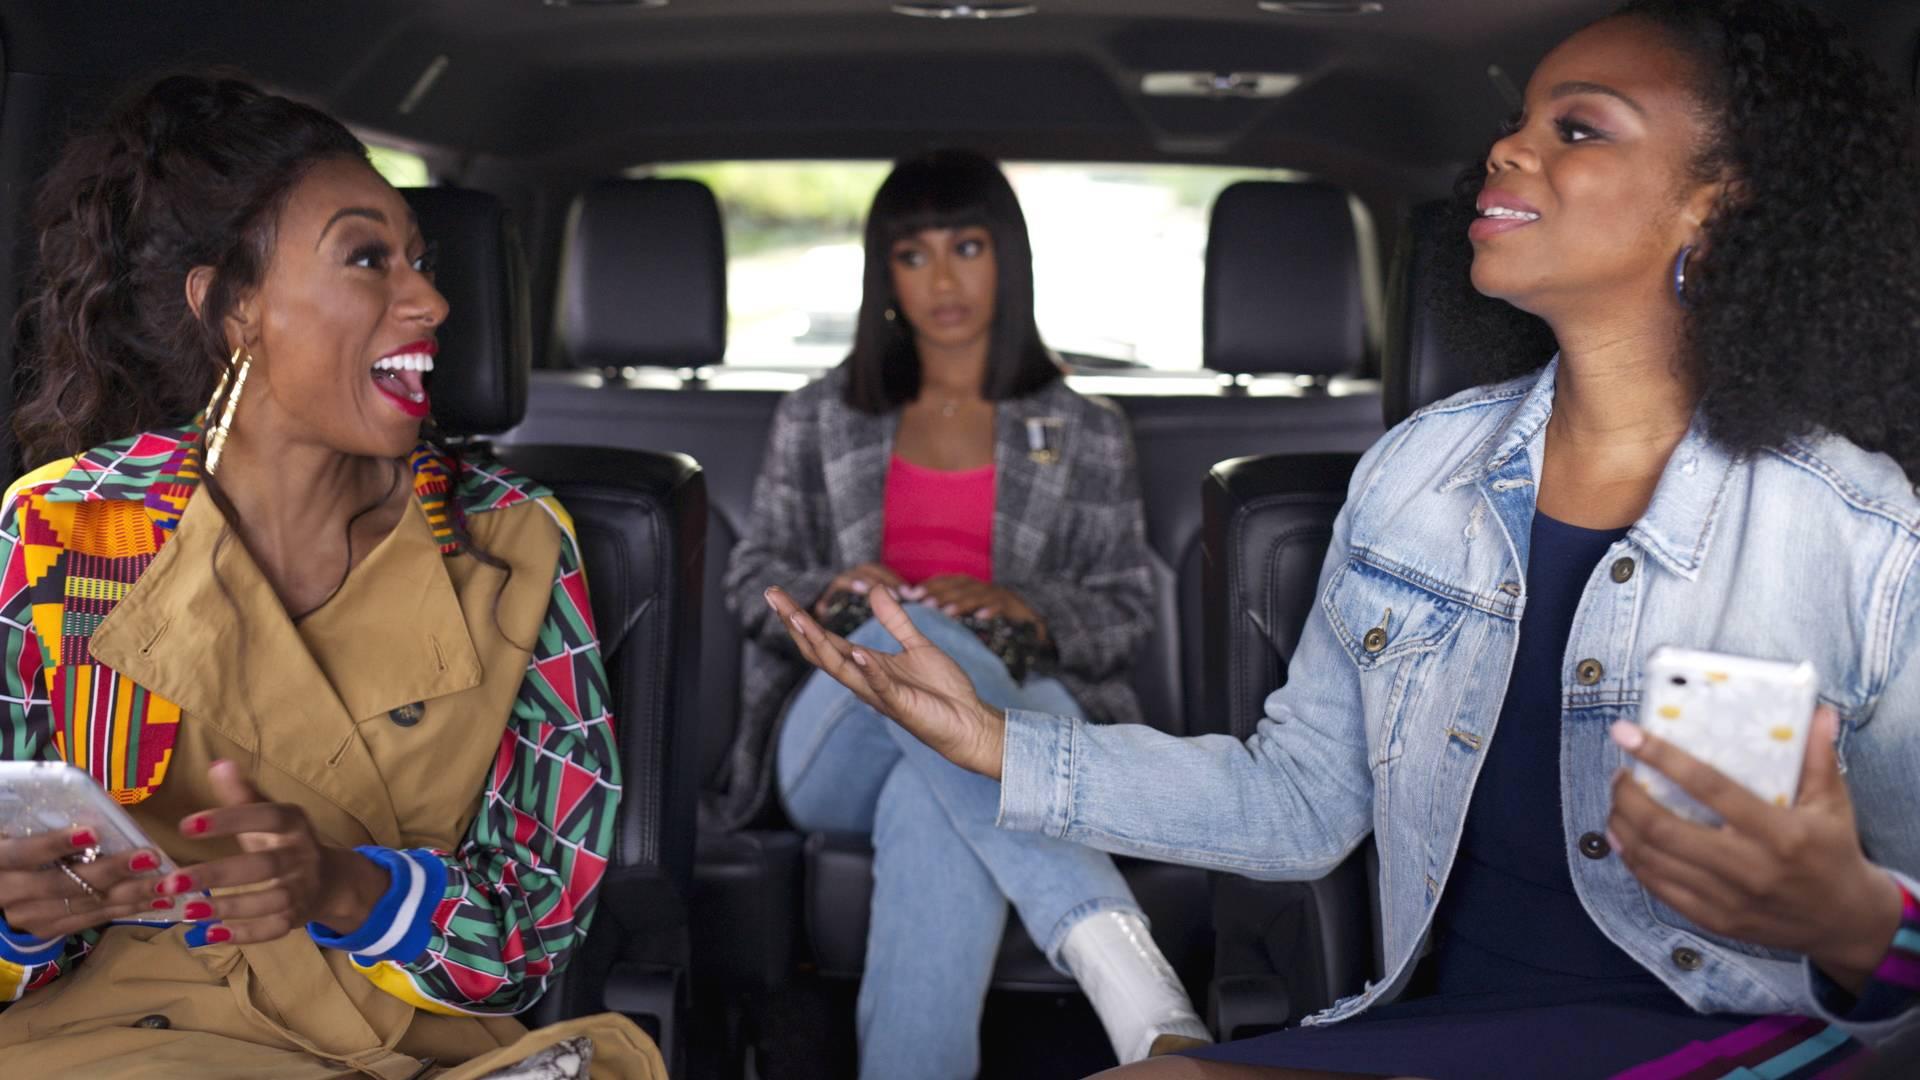 LaLa Milan, Tetona Jackson and Brittany Inge share a moment. - (Photo: BET)